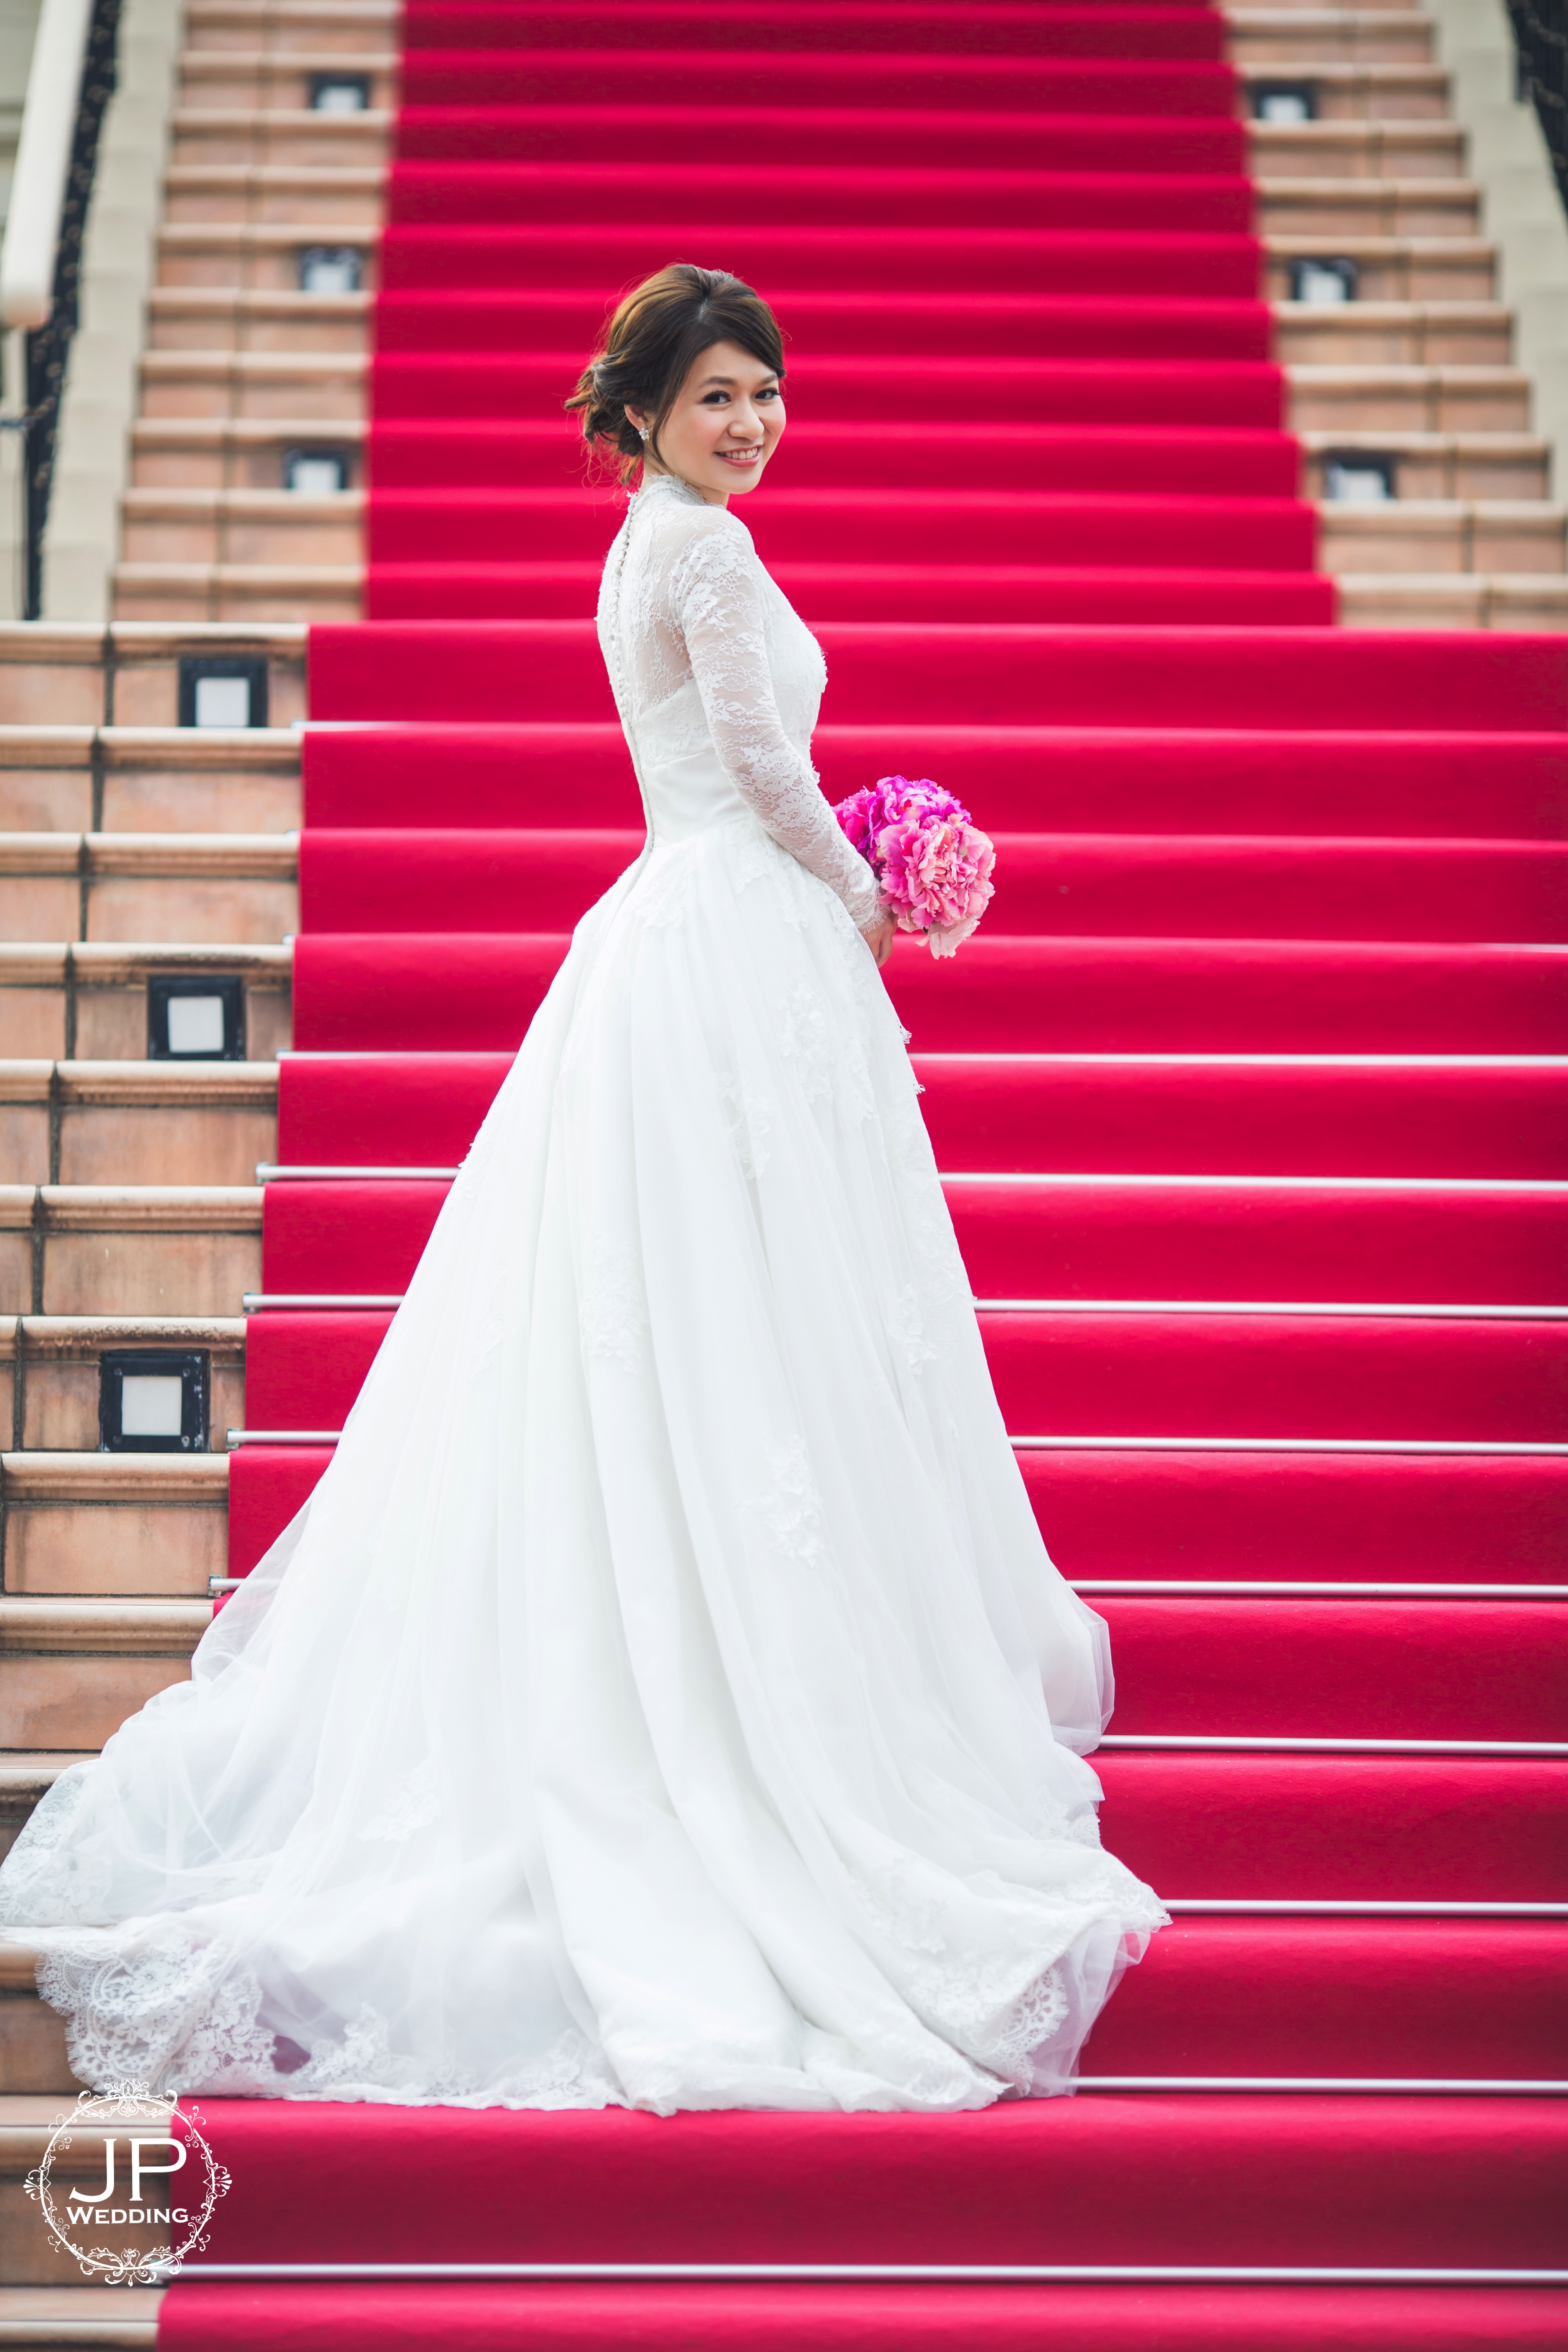 Japan Chapel Prewedding- JP Wedding